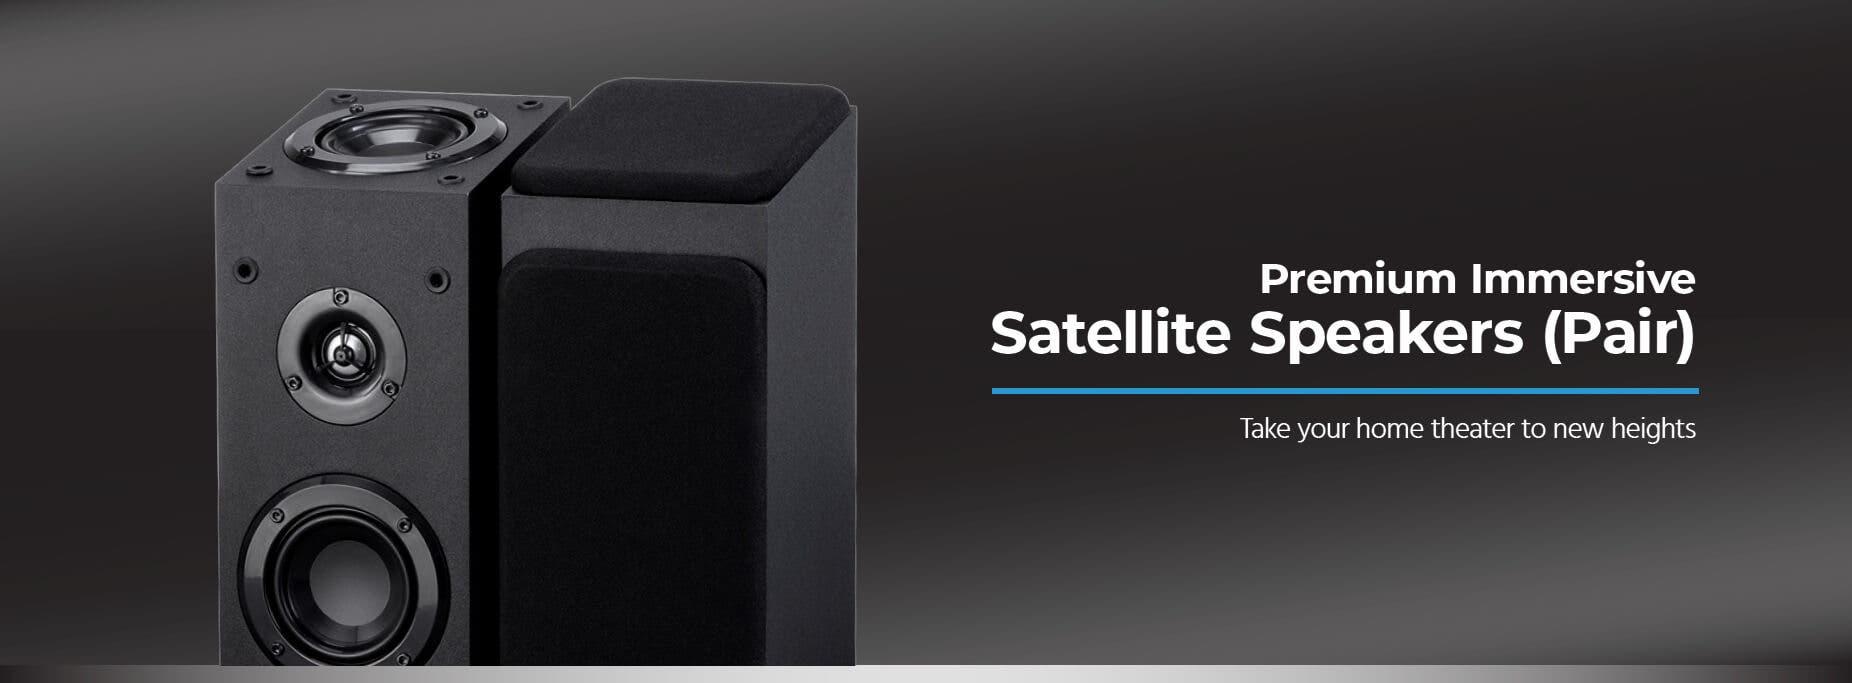 Immersive Satellite Speakers